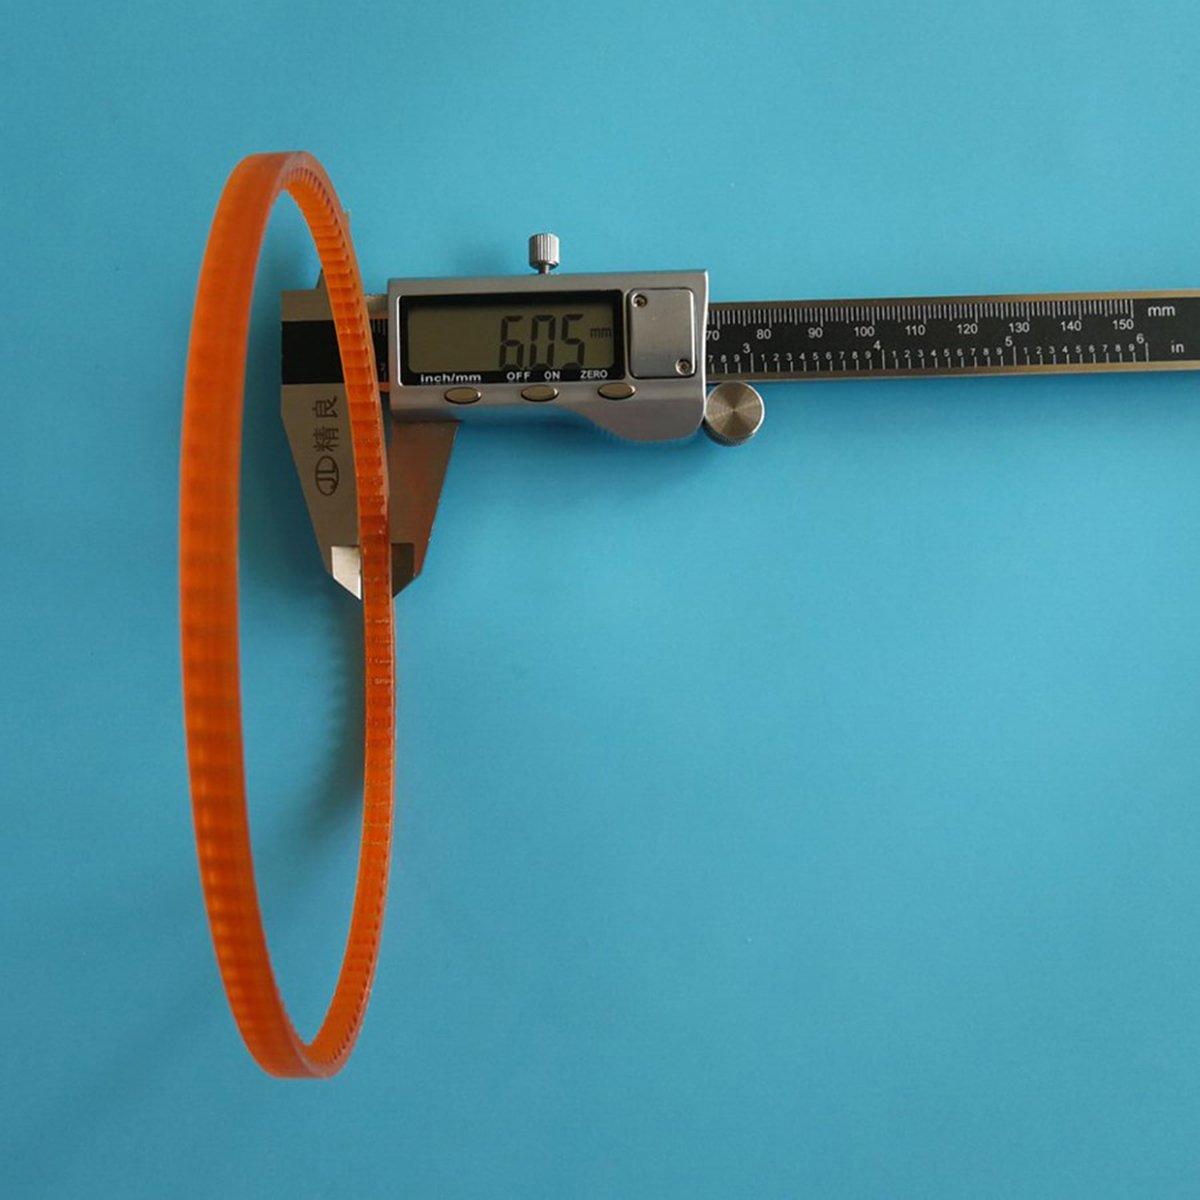 KUNPENG 222,301,301A Sewing 5 #194144 Motor Belt for Singer Featherweight 221